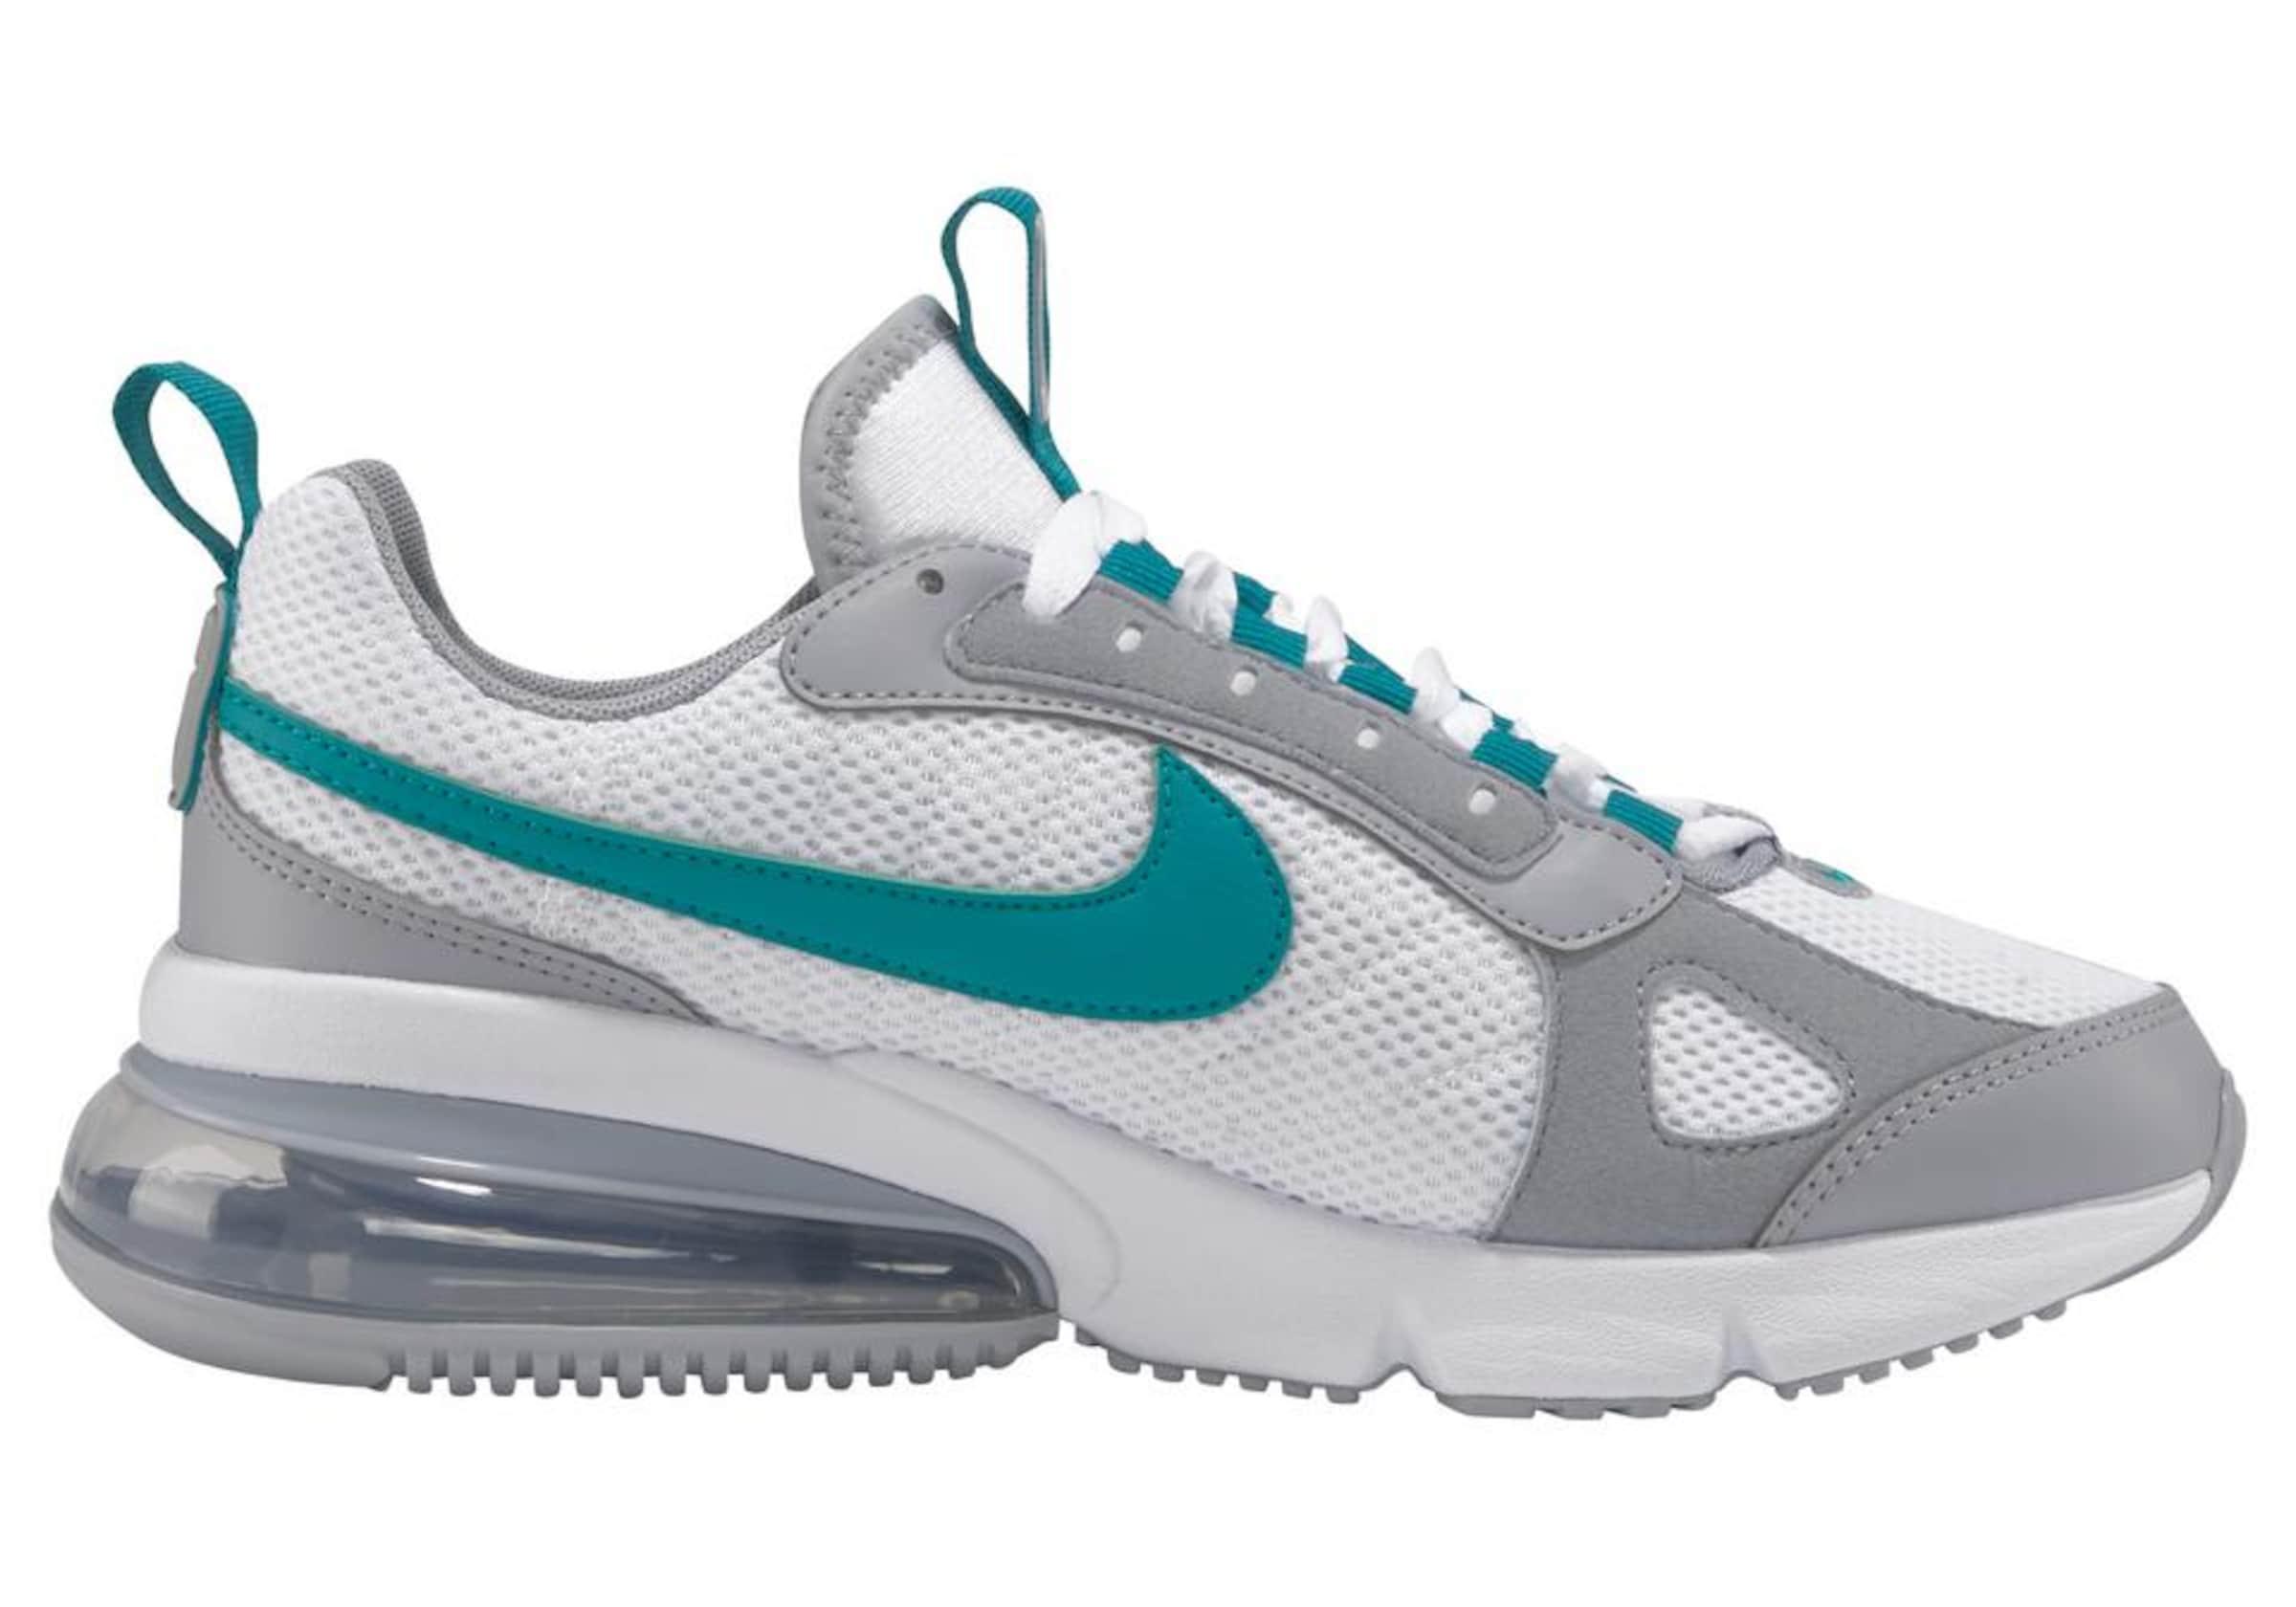 Sportswear Sneaker In Max 'air GrauPetrol Futura' Weiß Nike 270 8Nwv0Omn